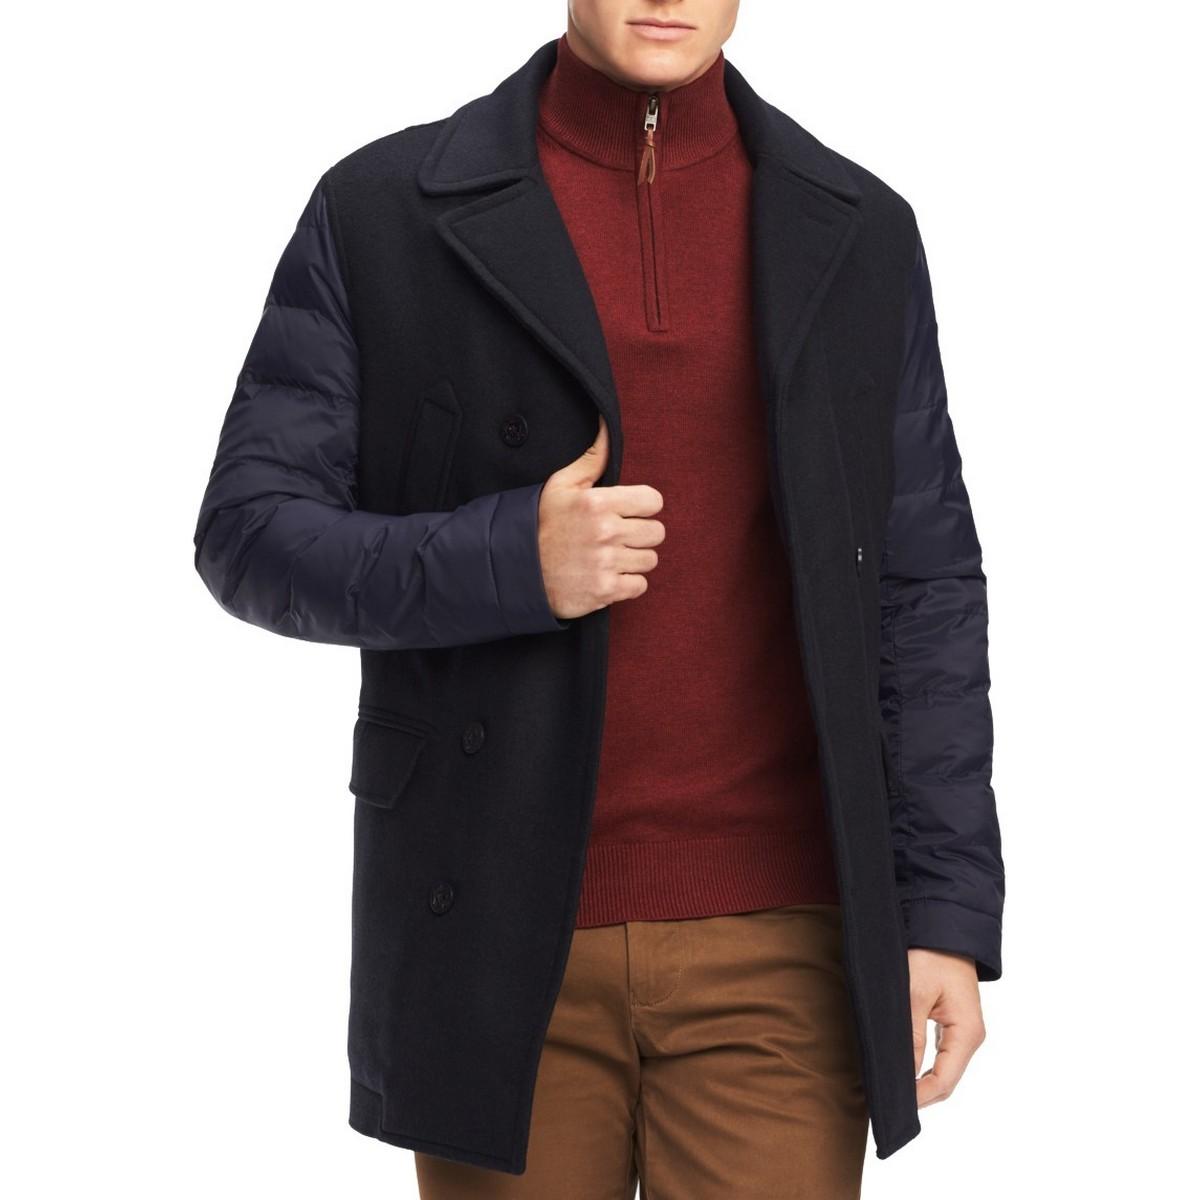 TOMMY HILFIGER Men/'s Grant Puffer-sleeve Utility Pea Coat Jacket TEDO